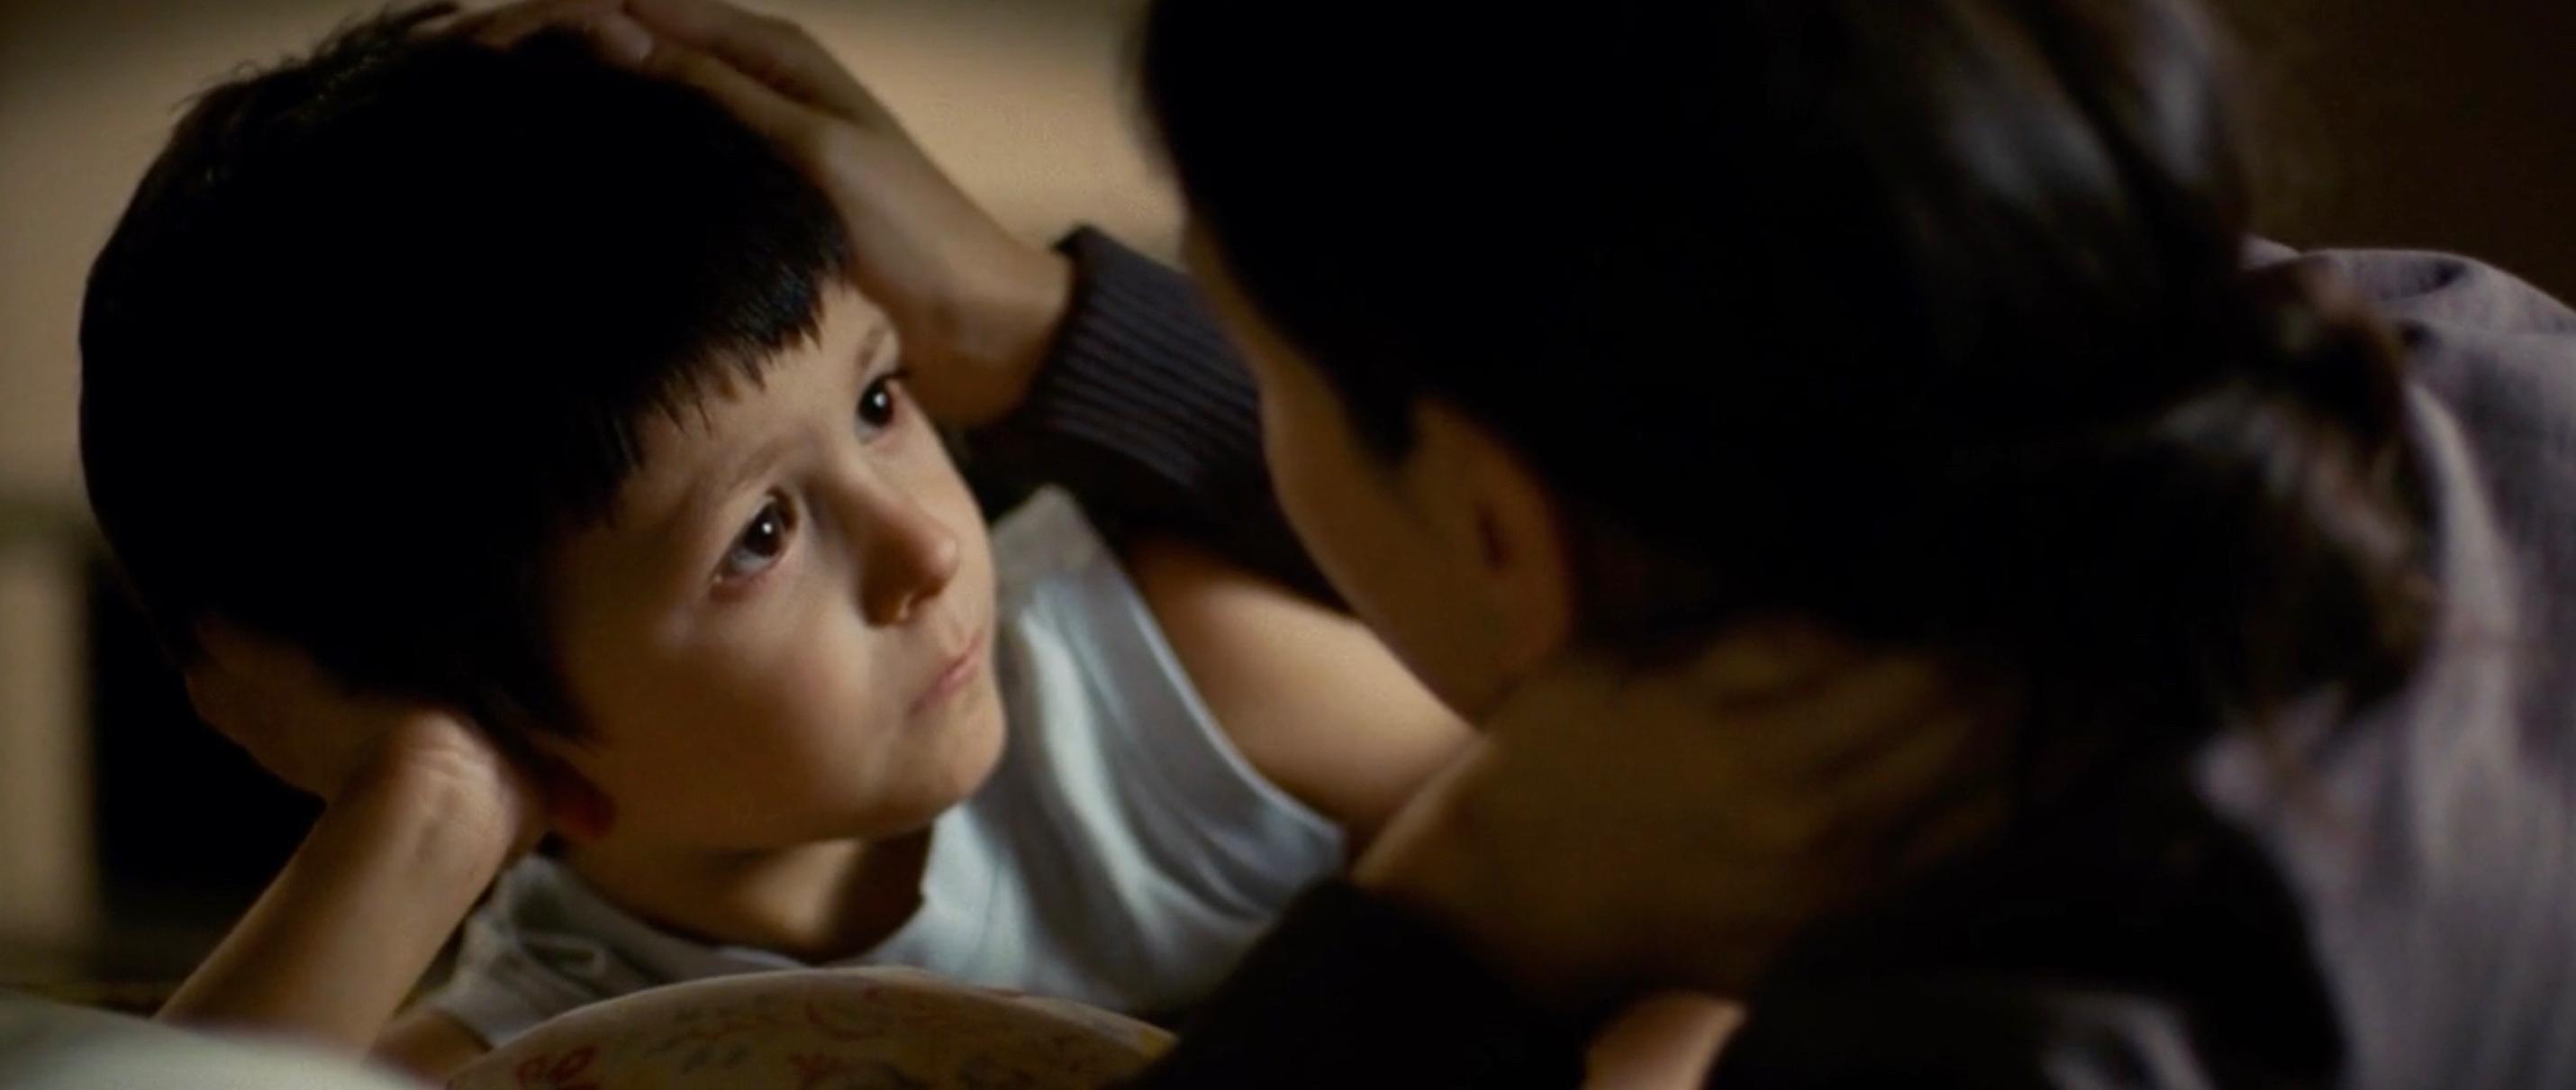 Die Fremde - Umay (Sibel Kekilli) mit Sohn Cem (Nizam Schiller) - close up - Regie: Feo Aladag - Kamera Judith Kaufmann